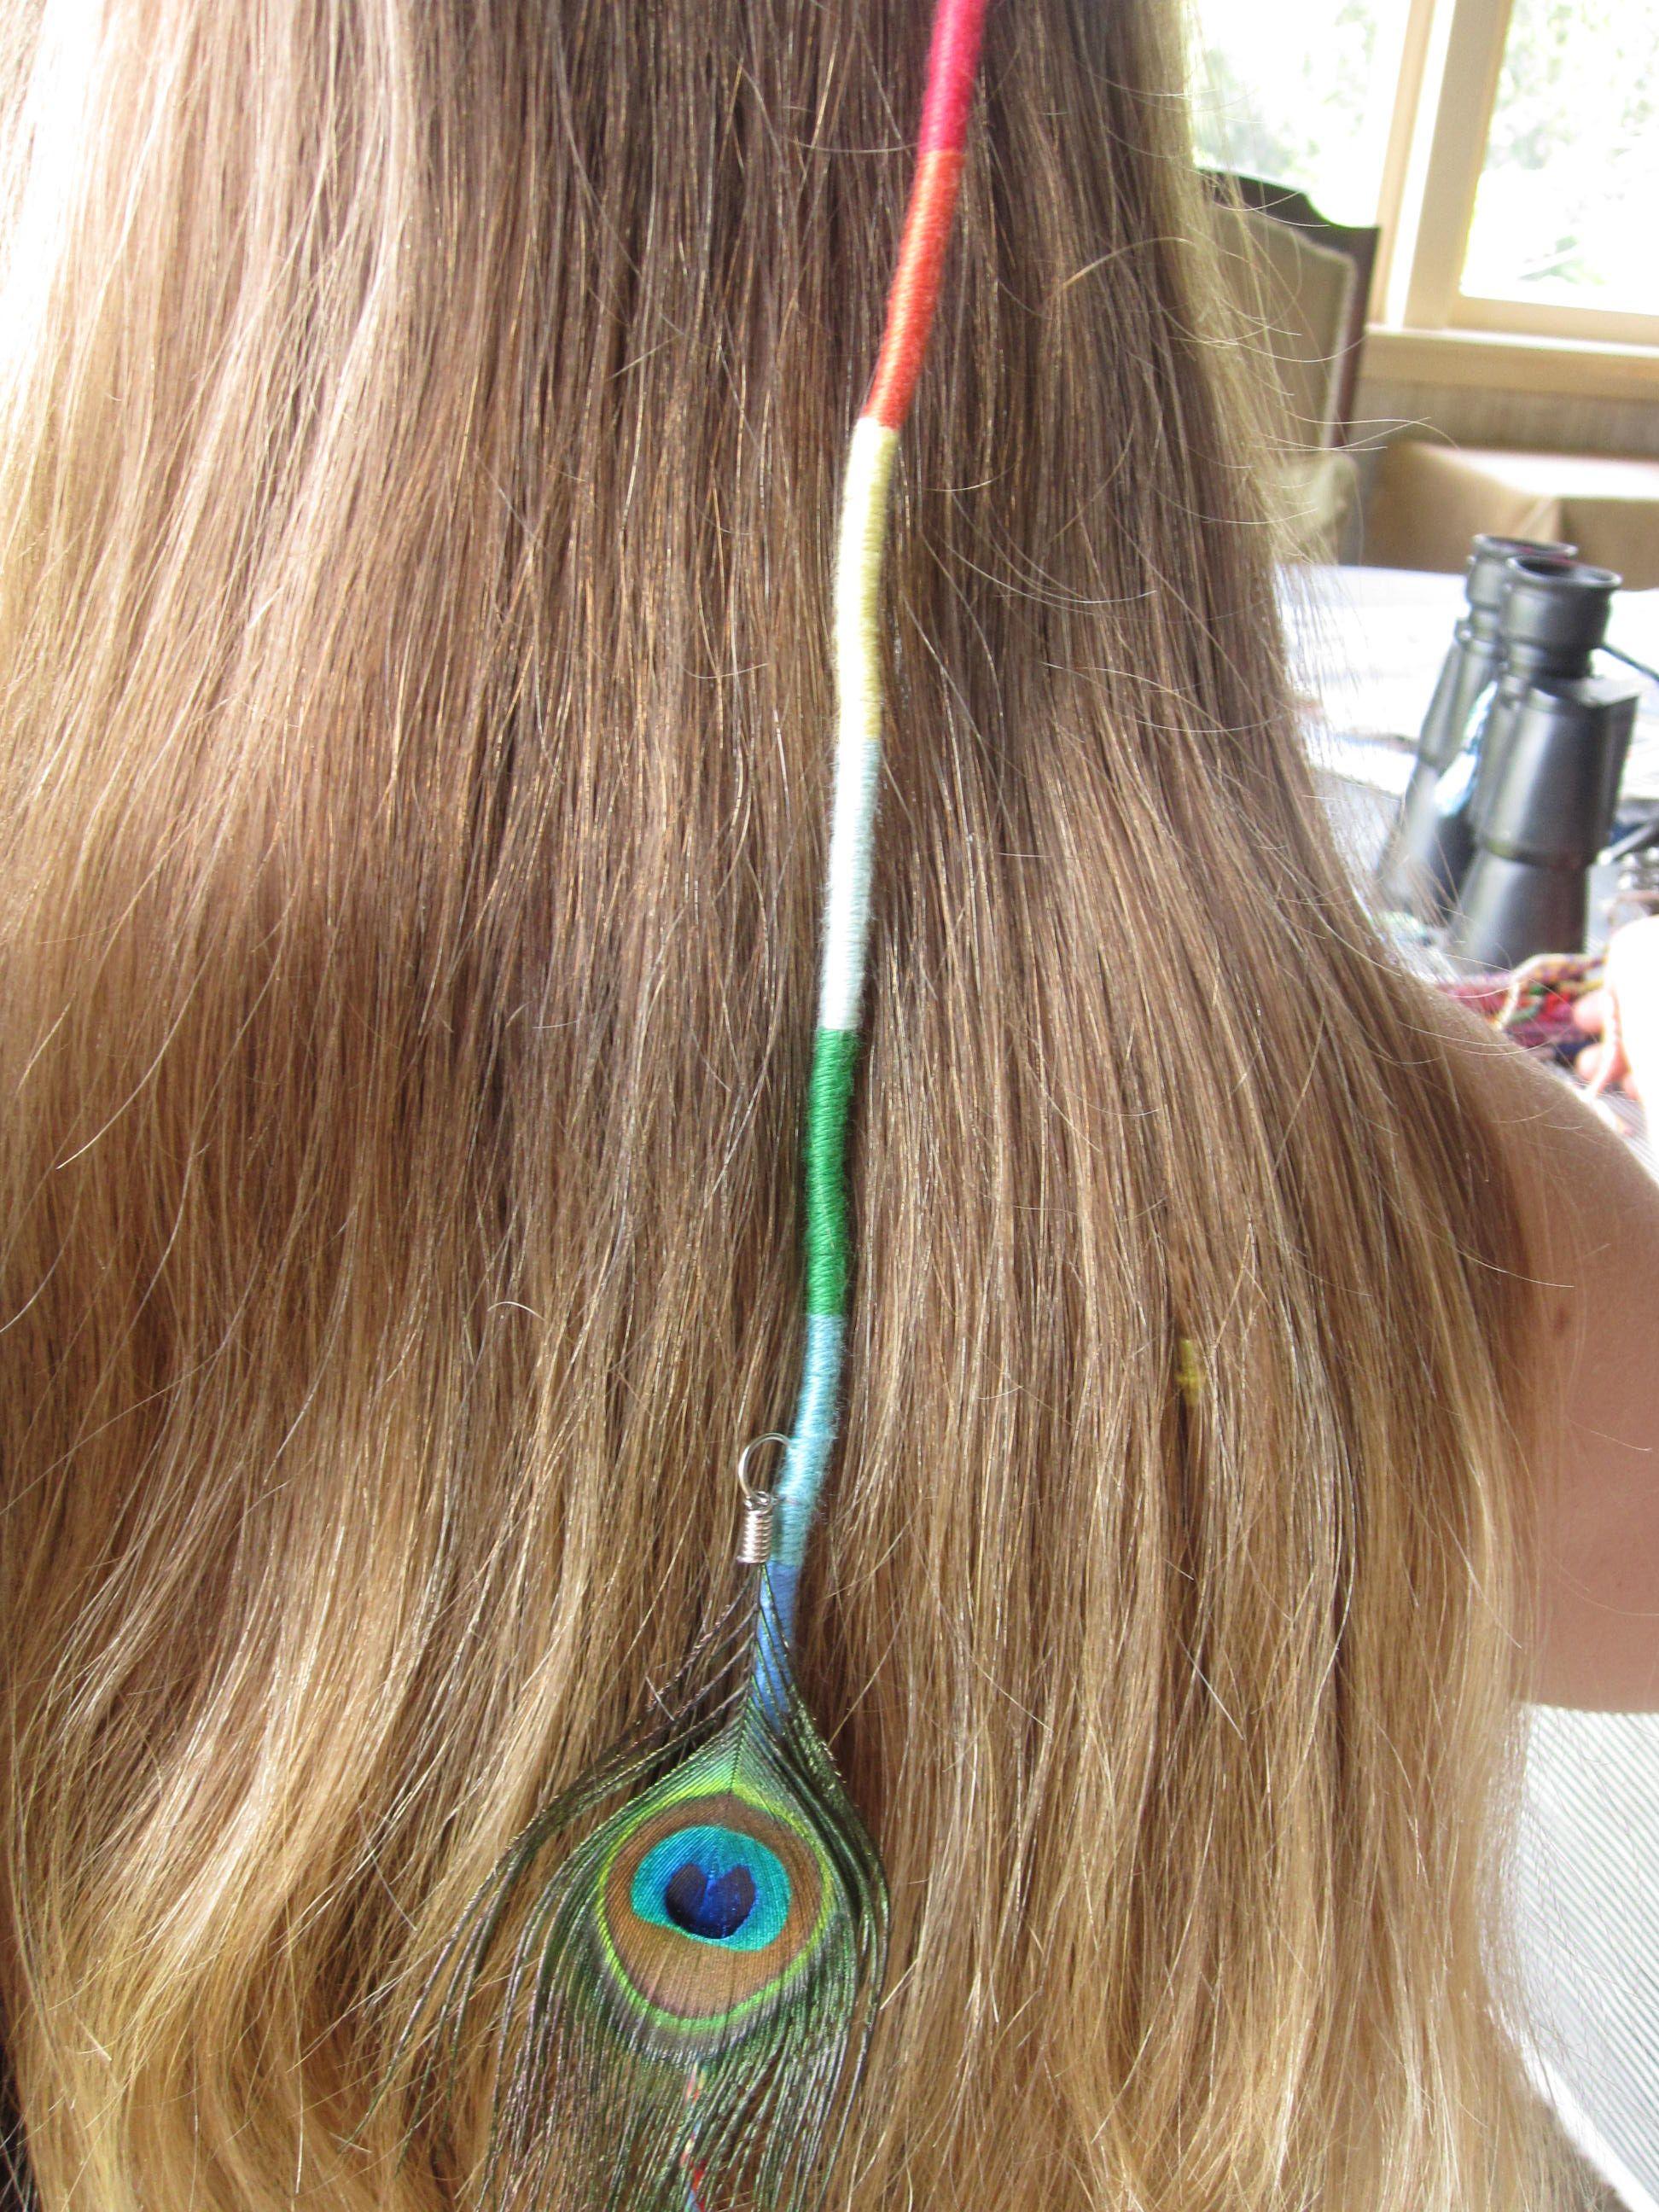 Hair Baid Wrap | 34 best hair braids wraps images on